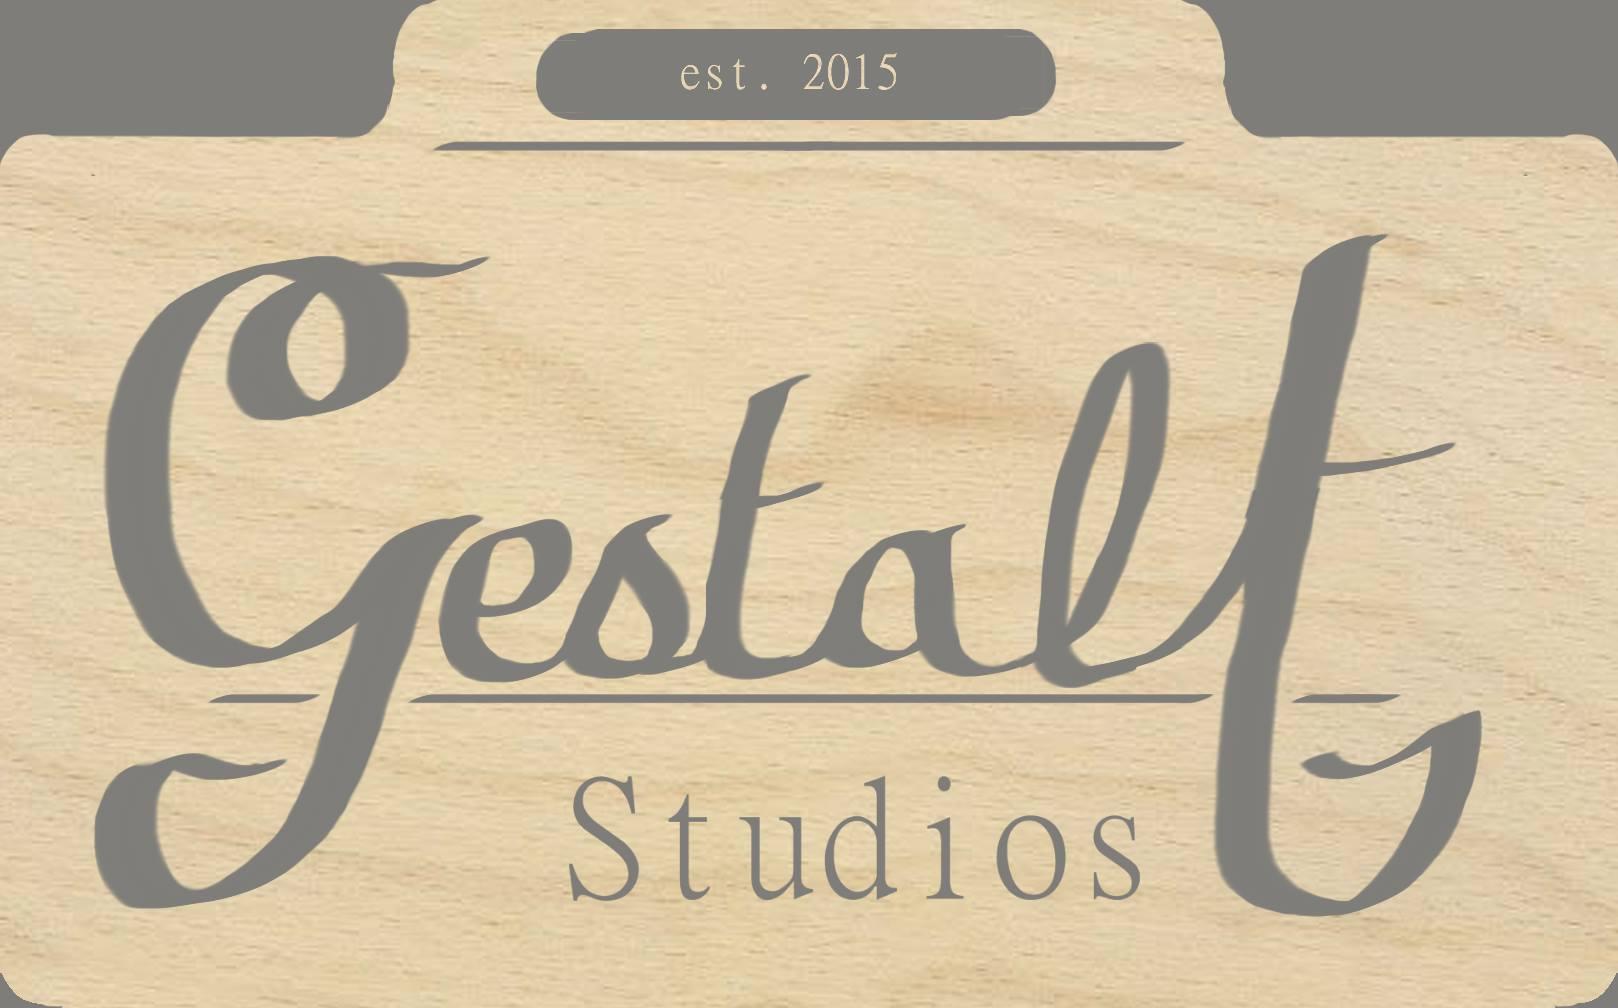 Gestalt Studios